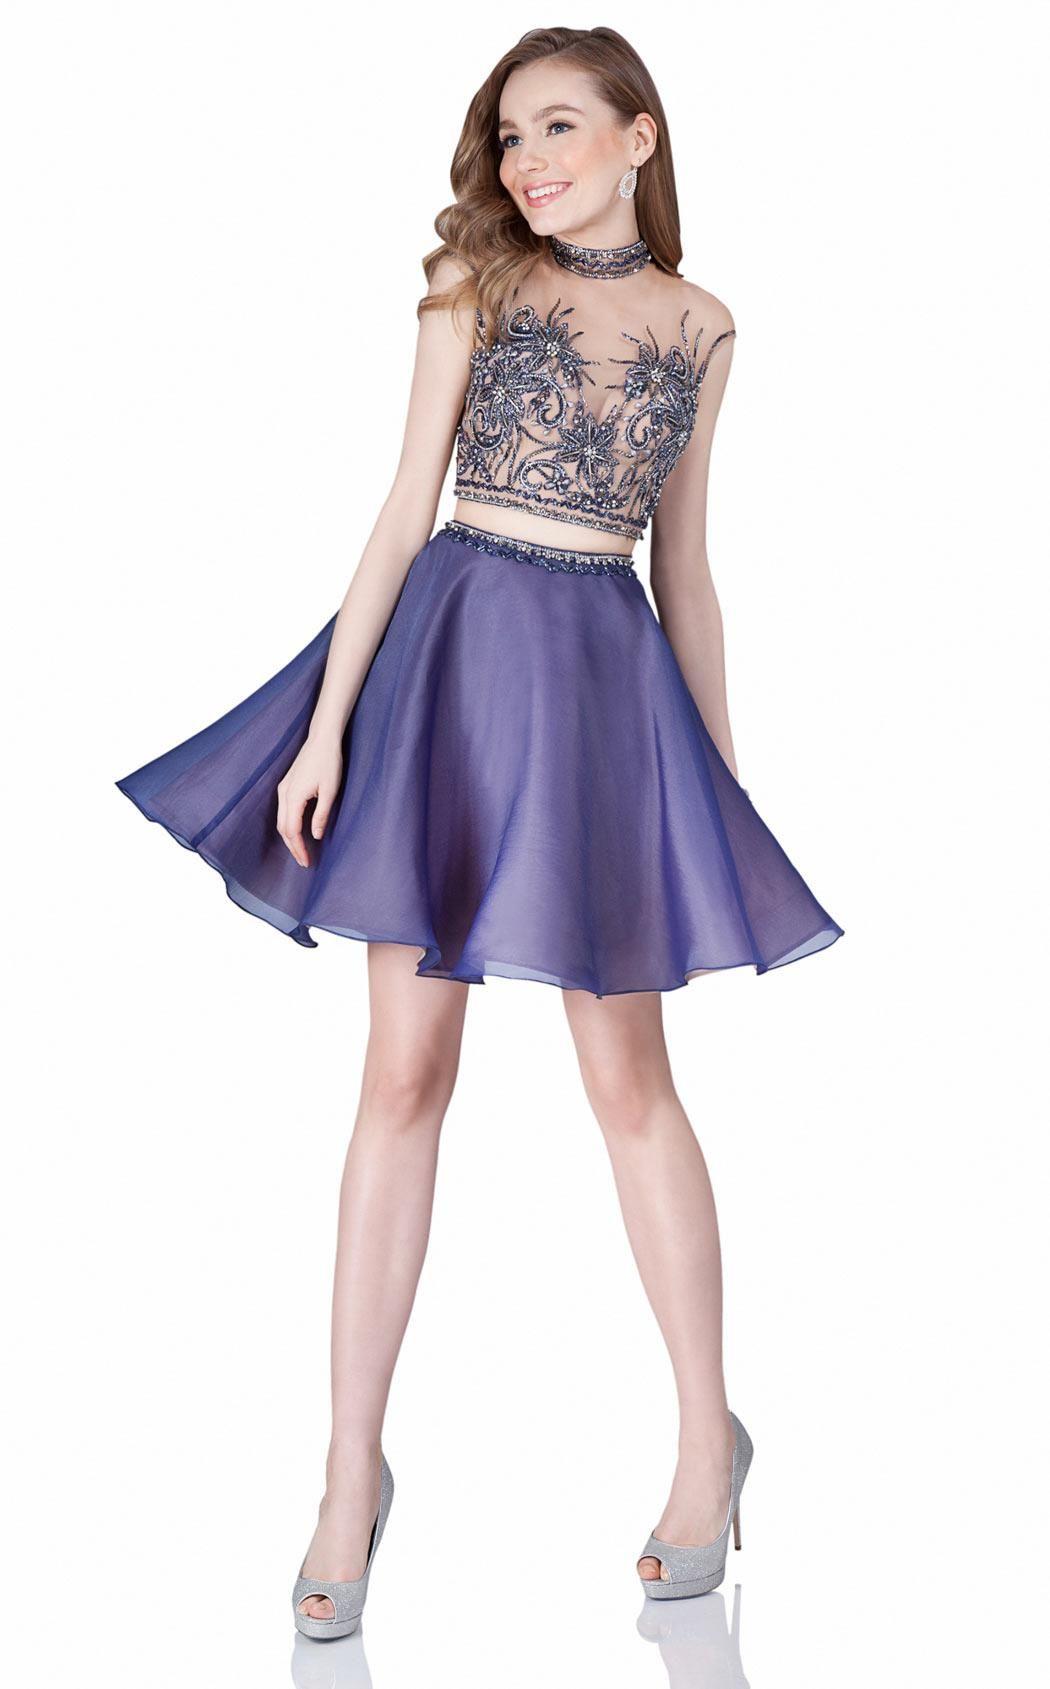 f04754297a3 Brand Designer  Terani Prom Occasion  Evening Homecoming Prom Dress Dress  Length  Cocktail Dress Silhouette  Two-Piece Shoulder  Sleeveless Neckline   High ...